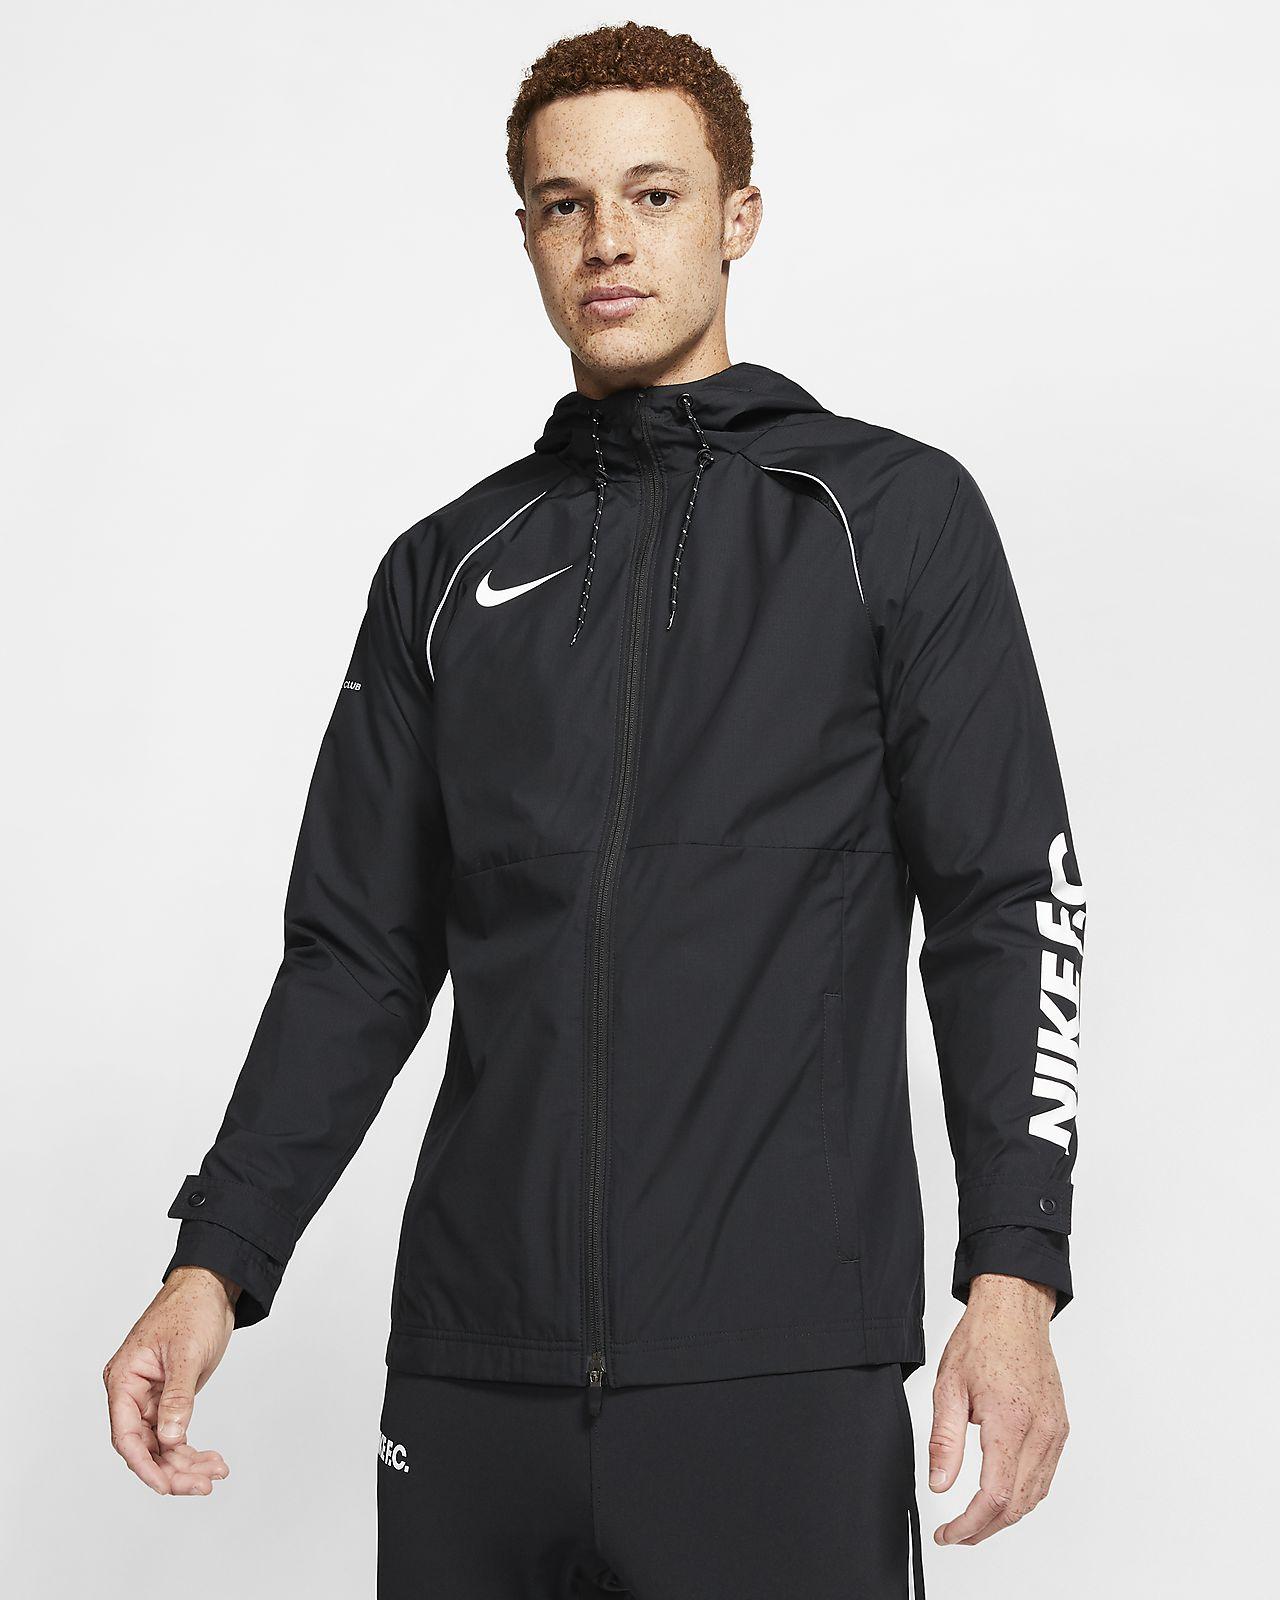 Veste de football Nike F.C. All Weather Fan pour Homme